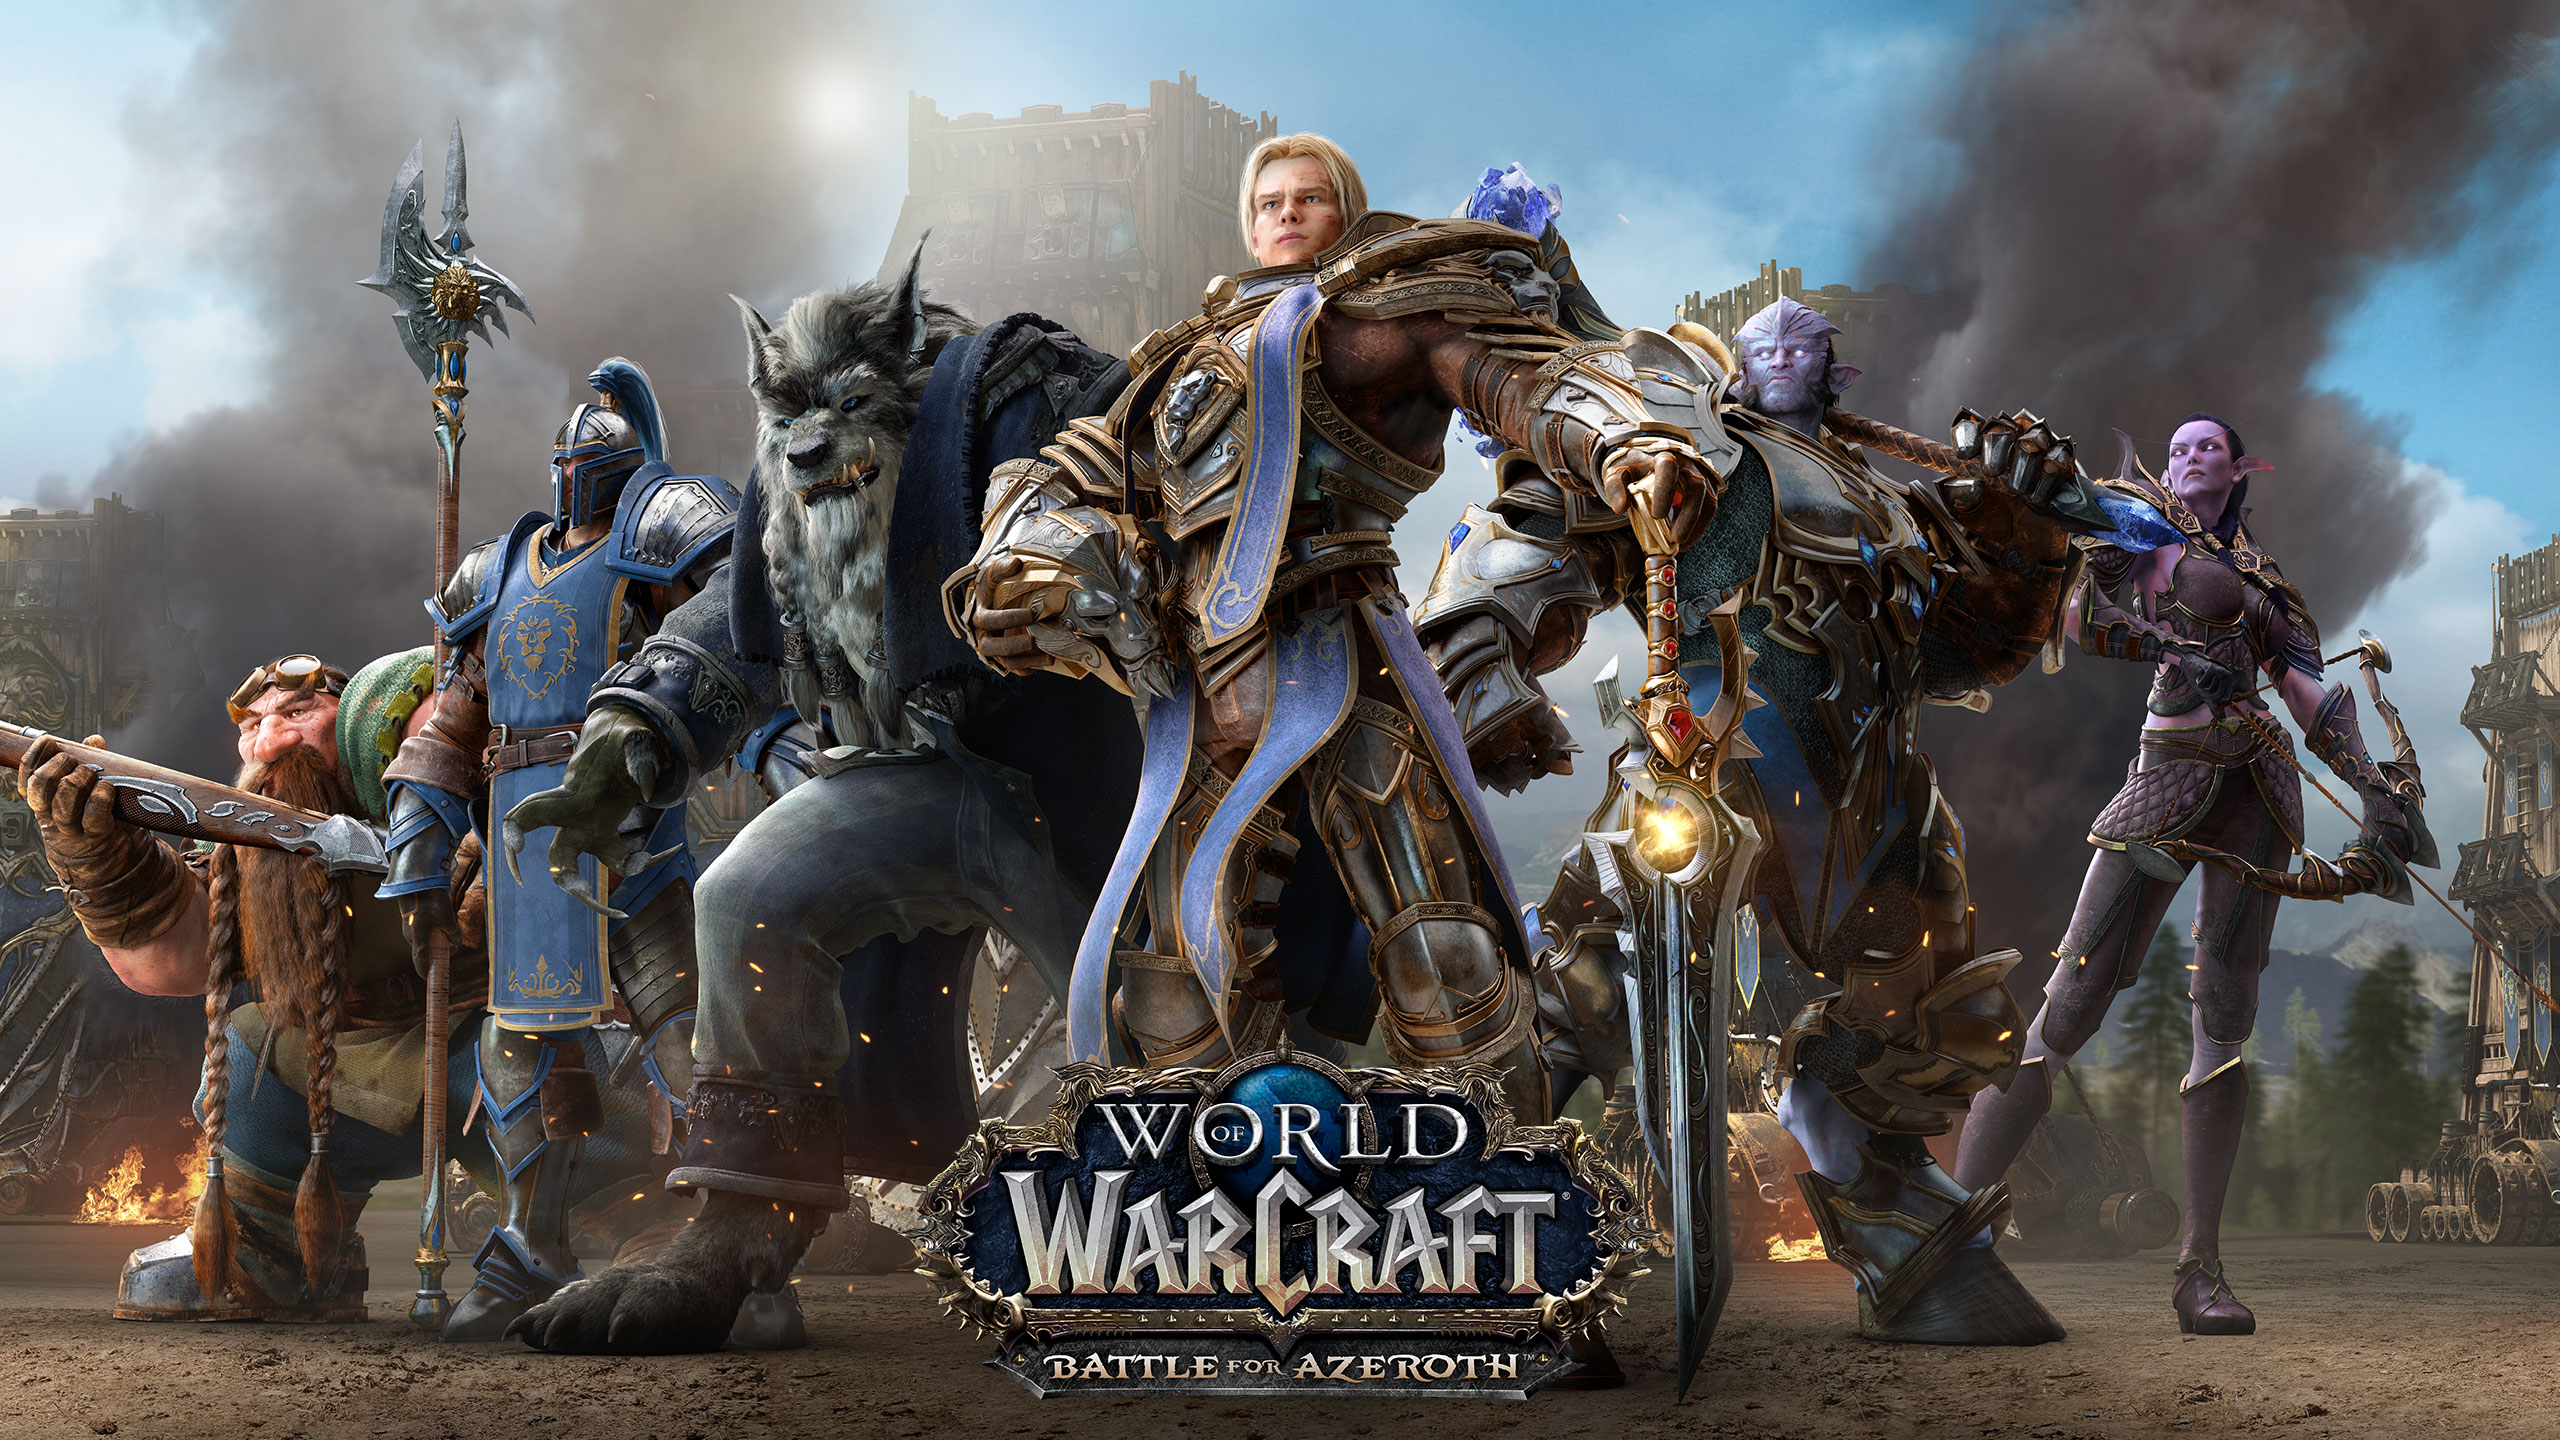 World of Warcraft: Battle for Azeroth - World of Warcraft Арт